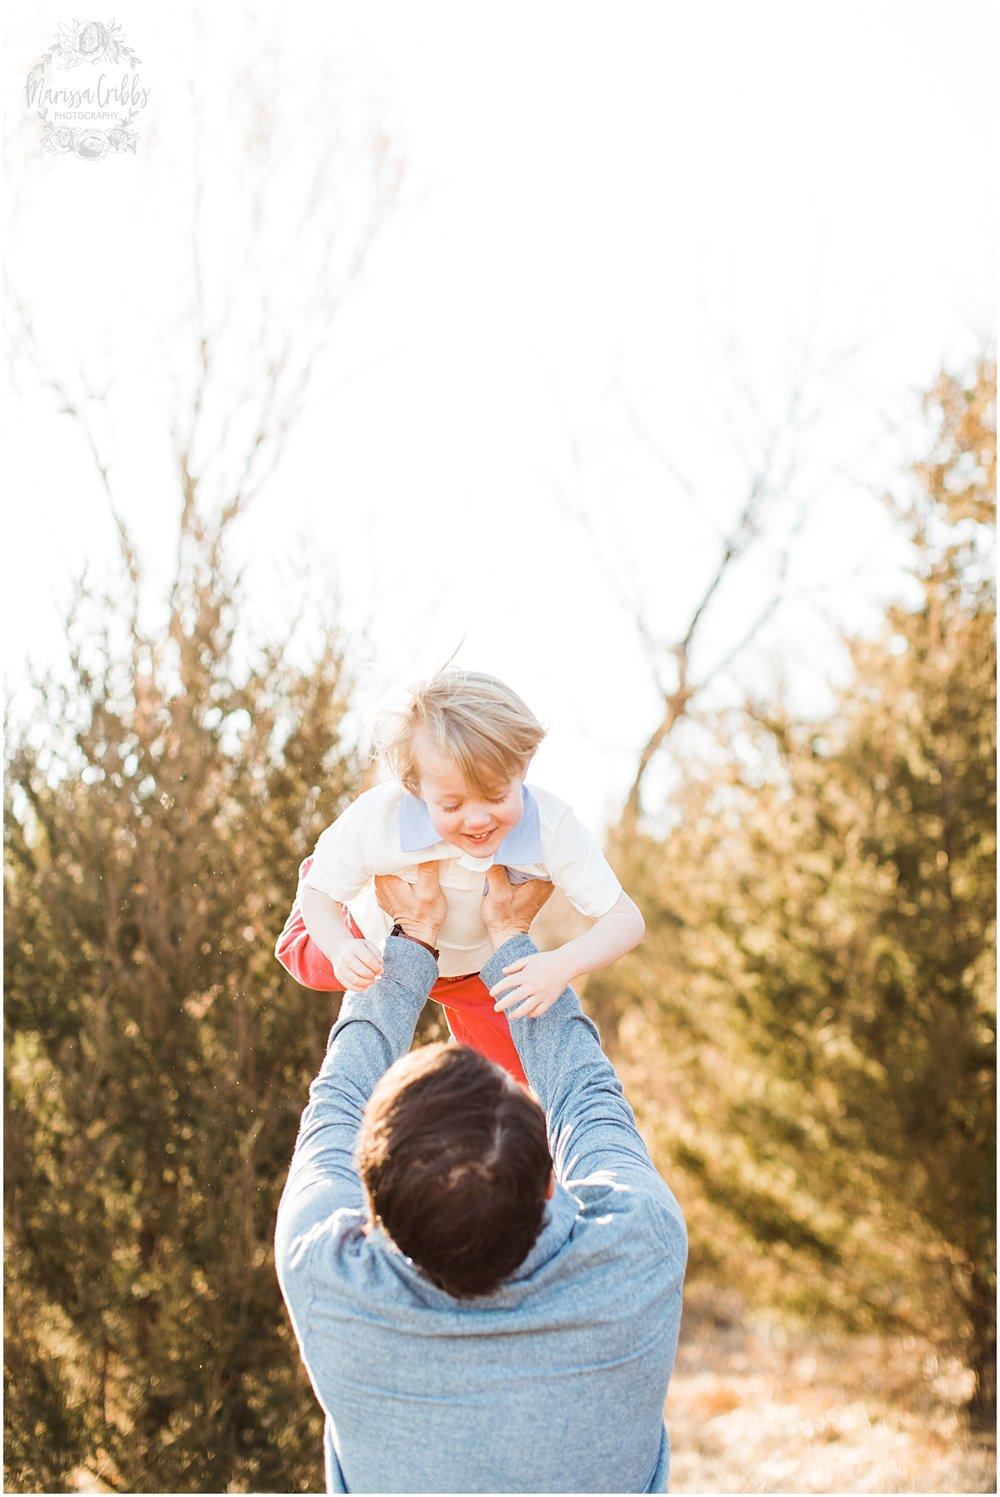 ORWIG FAMILY | MARISSA CRIBBS PHOTOGRAPHY_4236.jpg